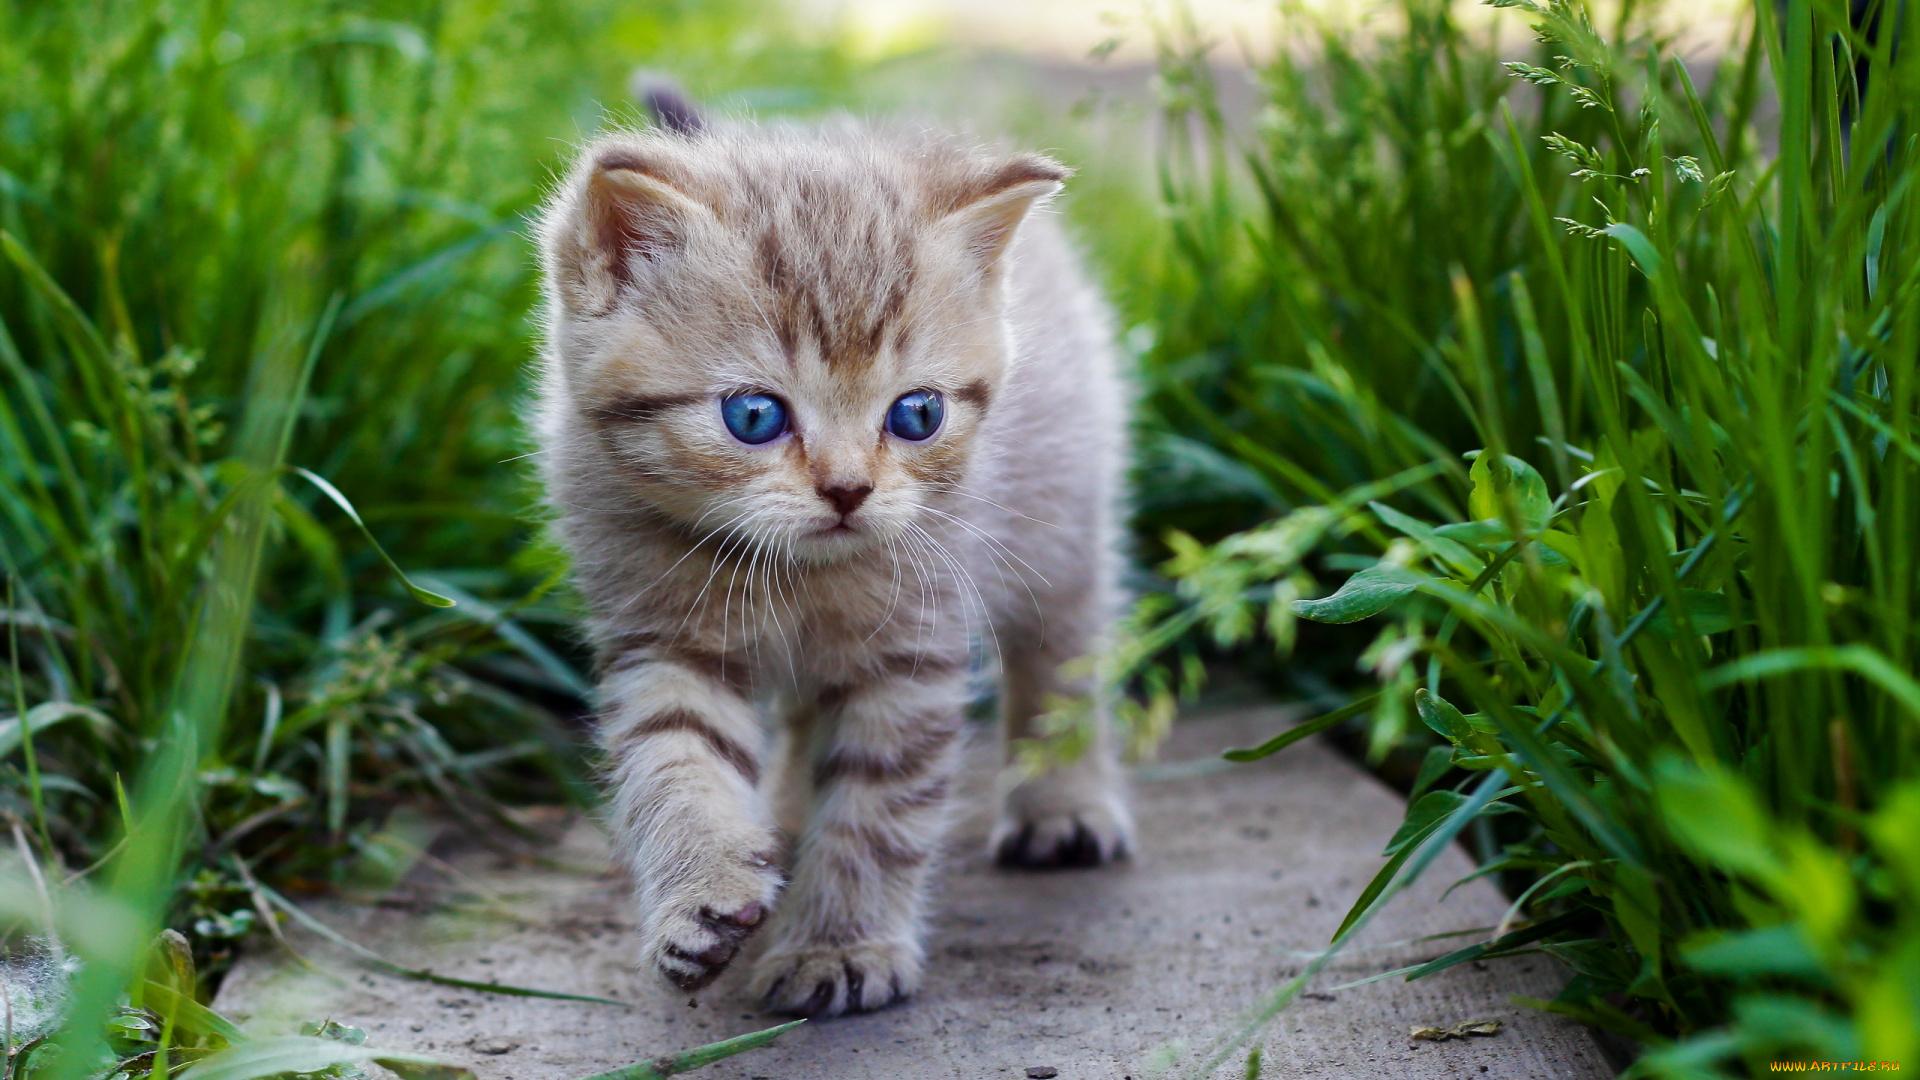 Котенок на травке  № 2954306 бесплатно